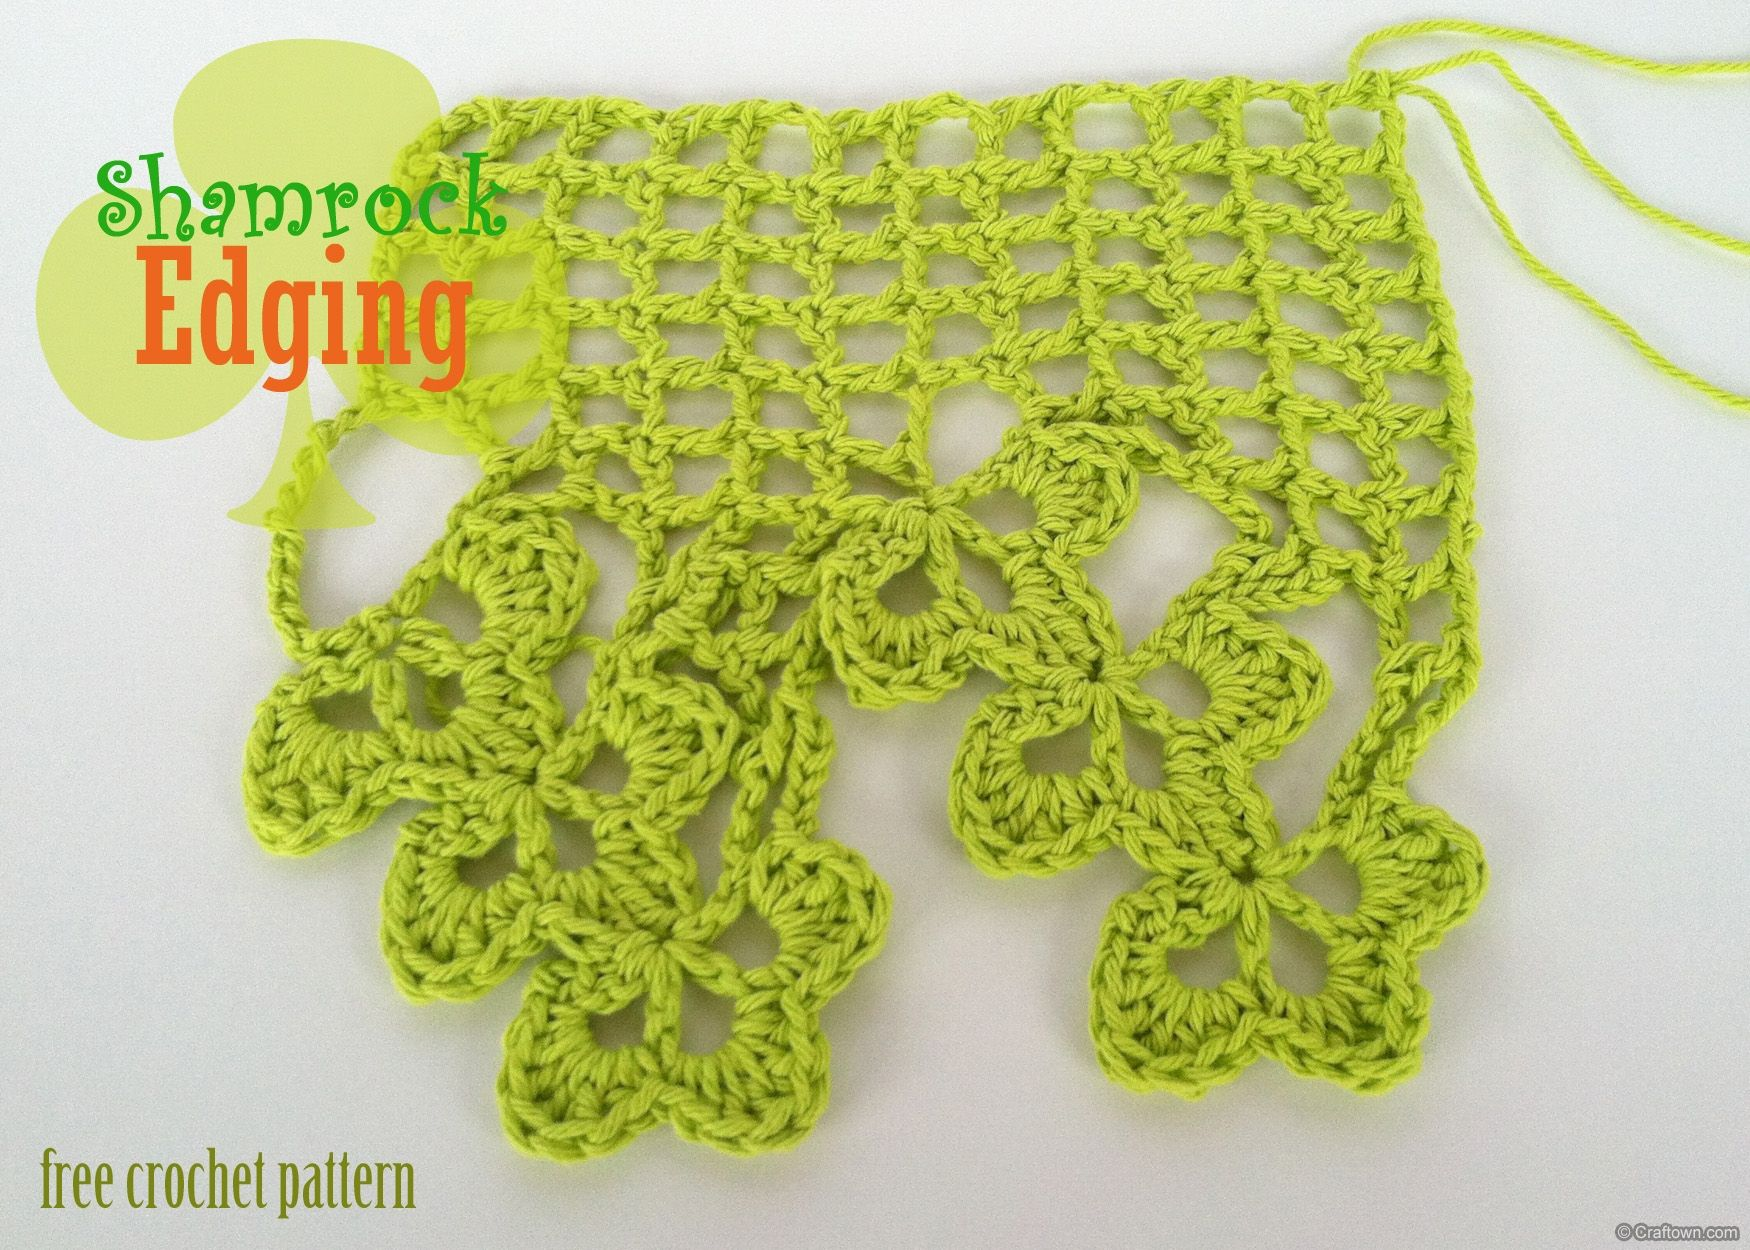 Free crochet pattern shamrock edging crochet patterns free crochet pattern shamrock edging bankloansurffo Image collections